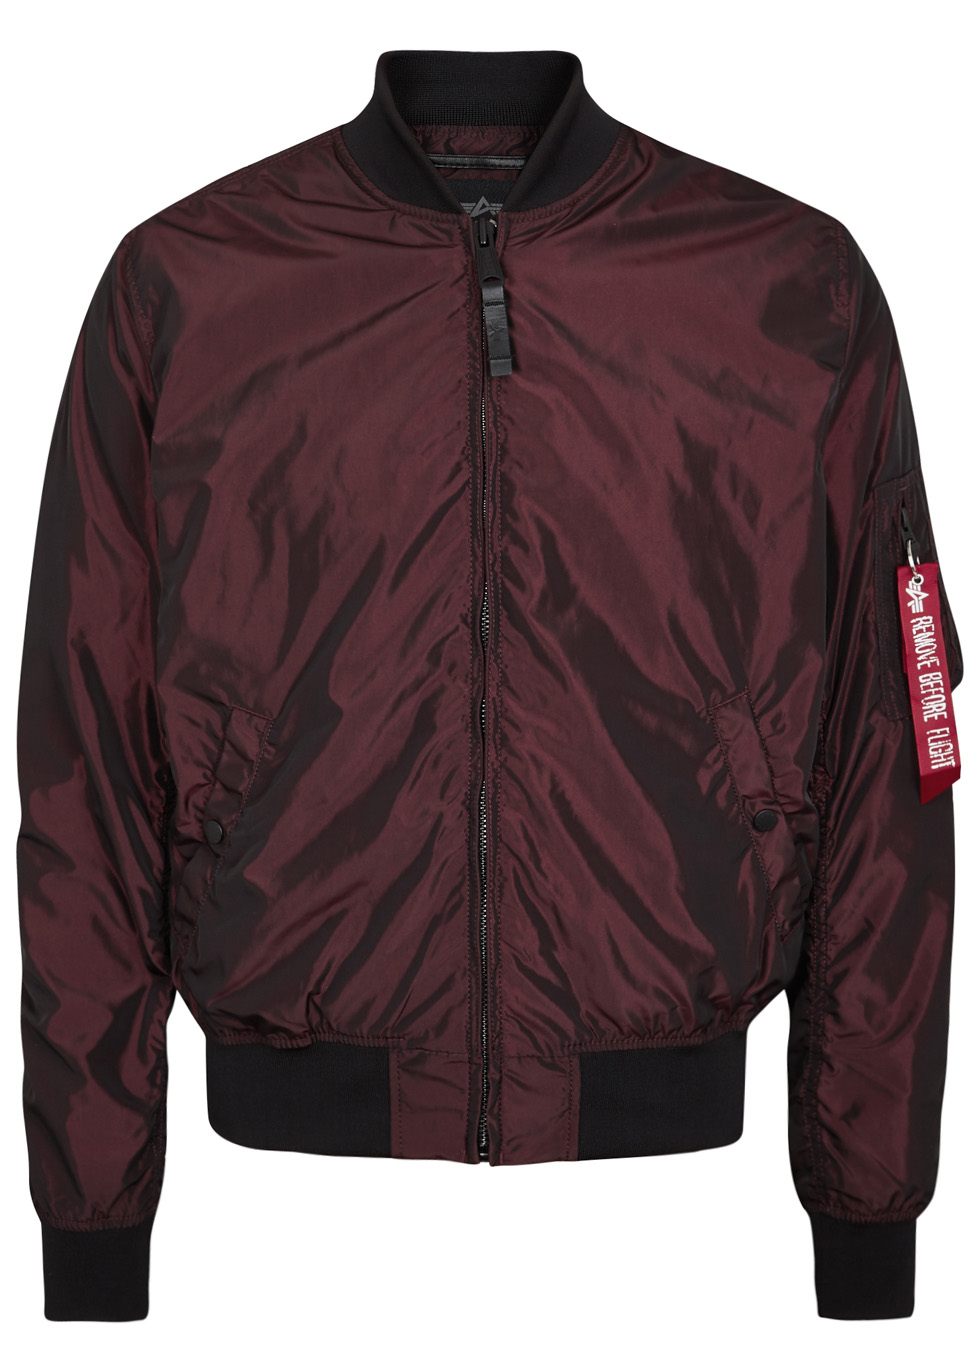 8ee432e7 Men's Designer Jackets - Winter Jackets for Men - Harvey Nichols